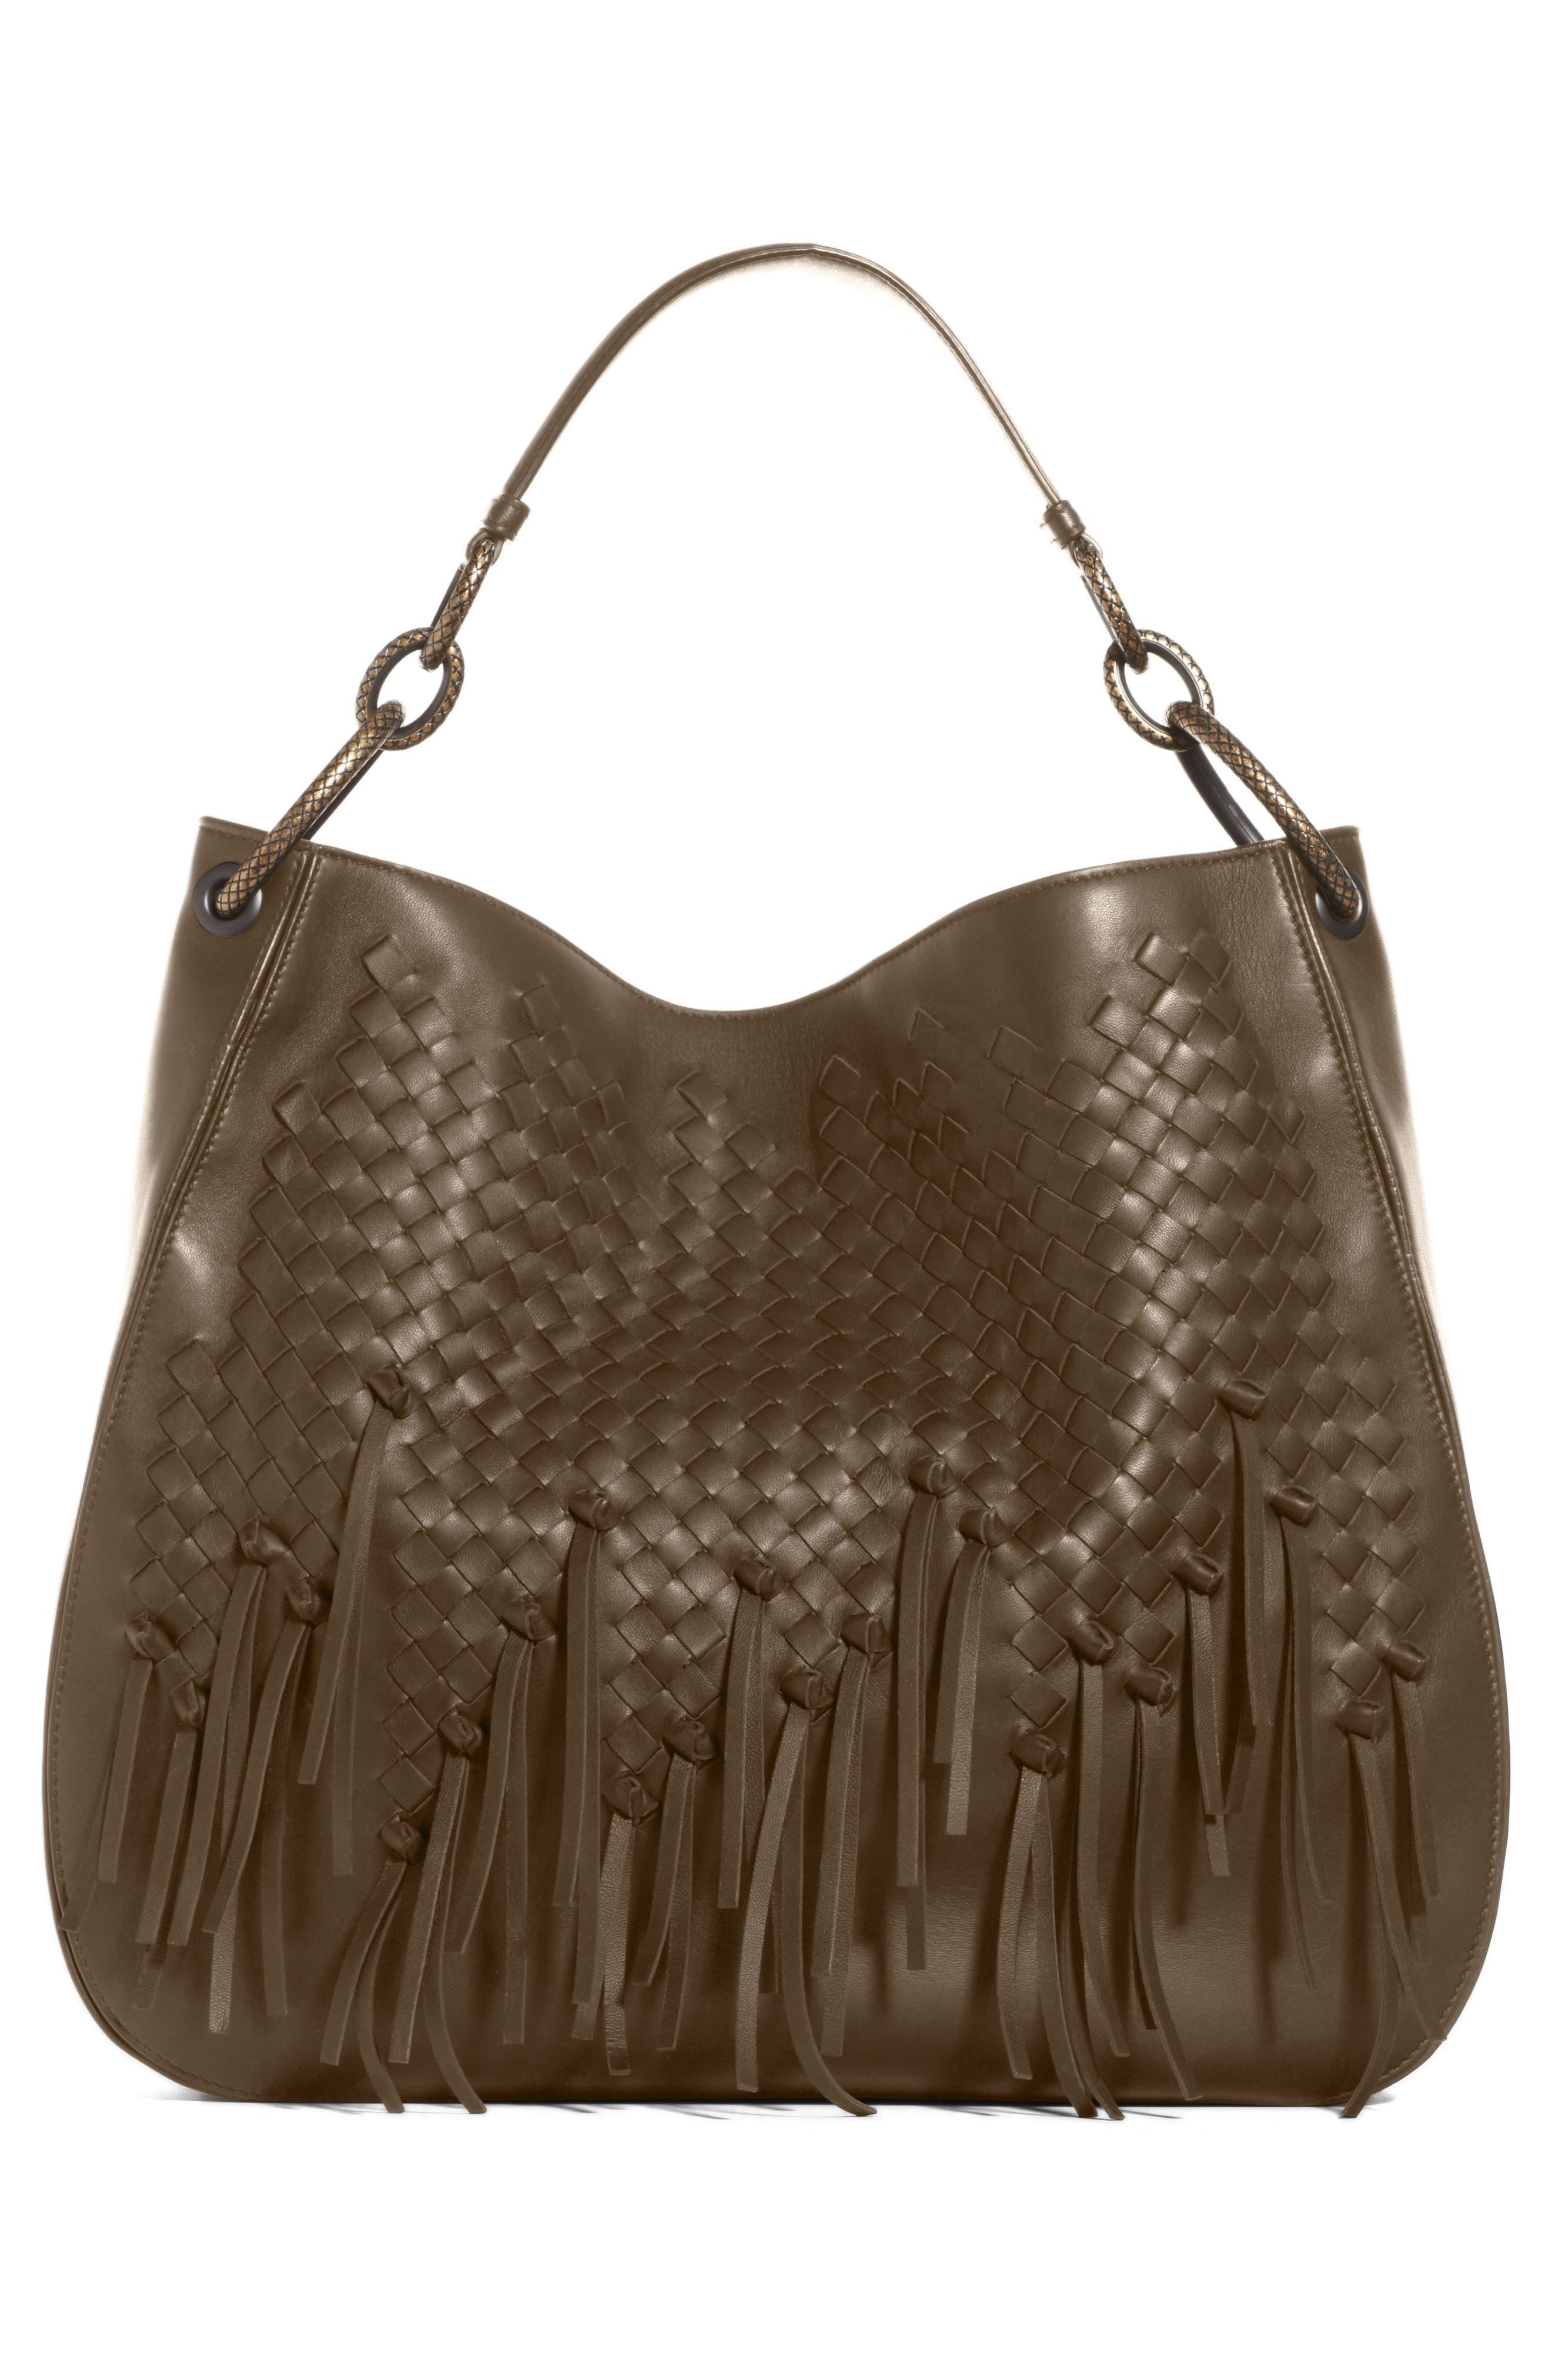 Bottega Veneta Large Loop Fringe Leather Hobo